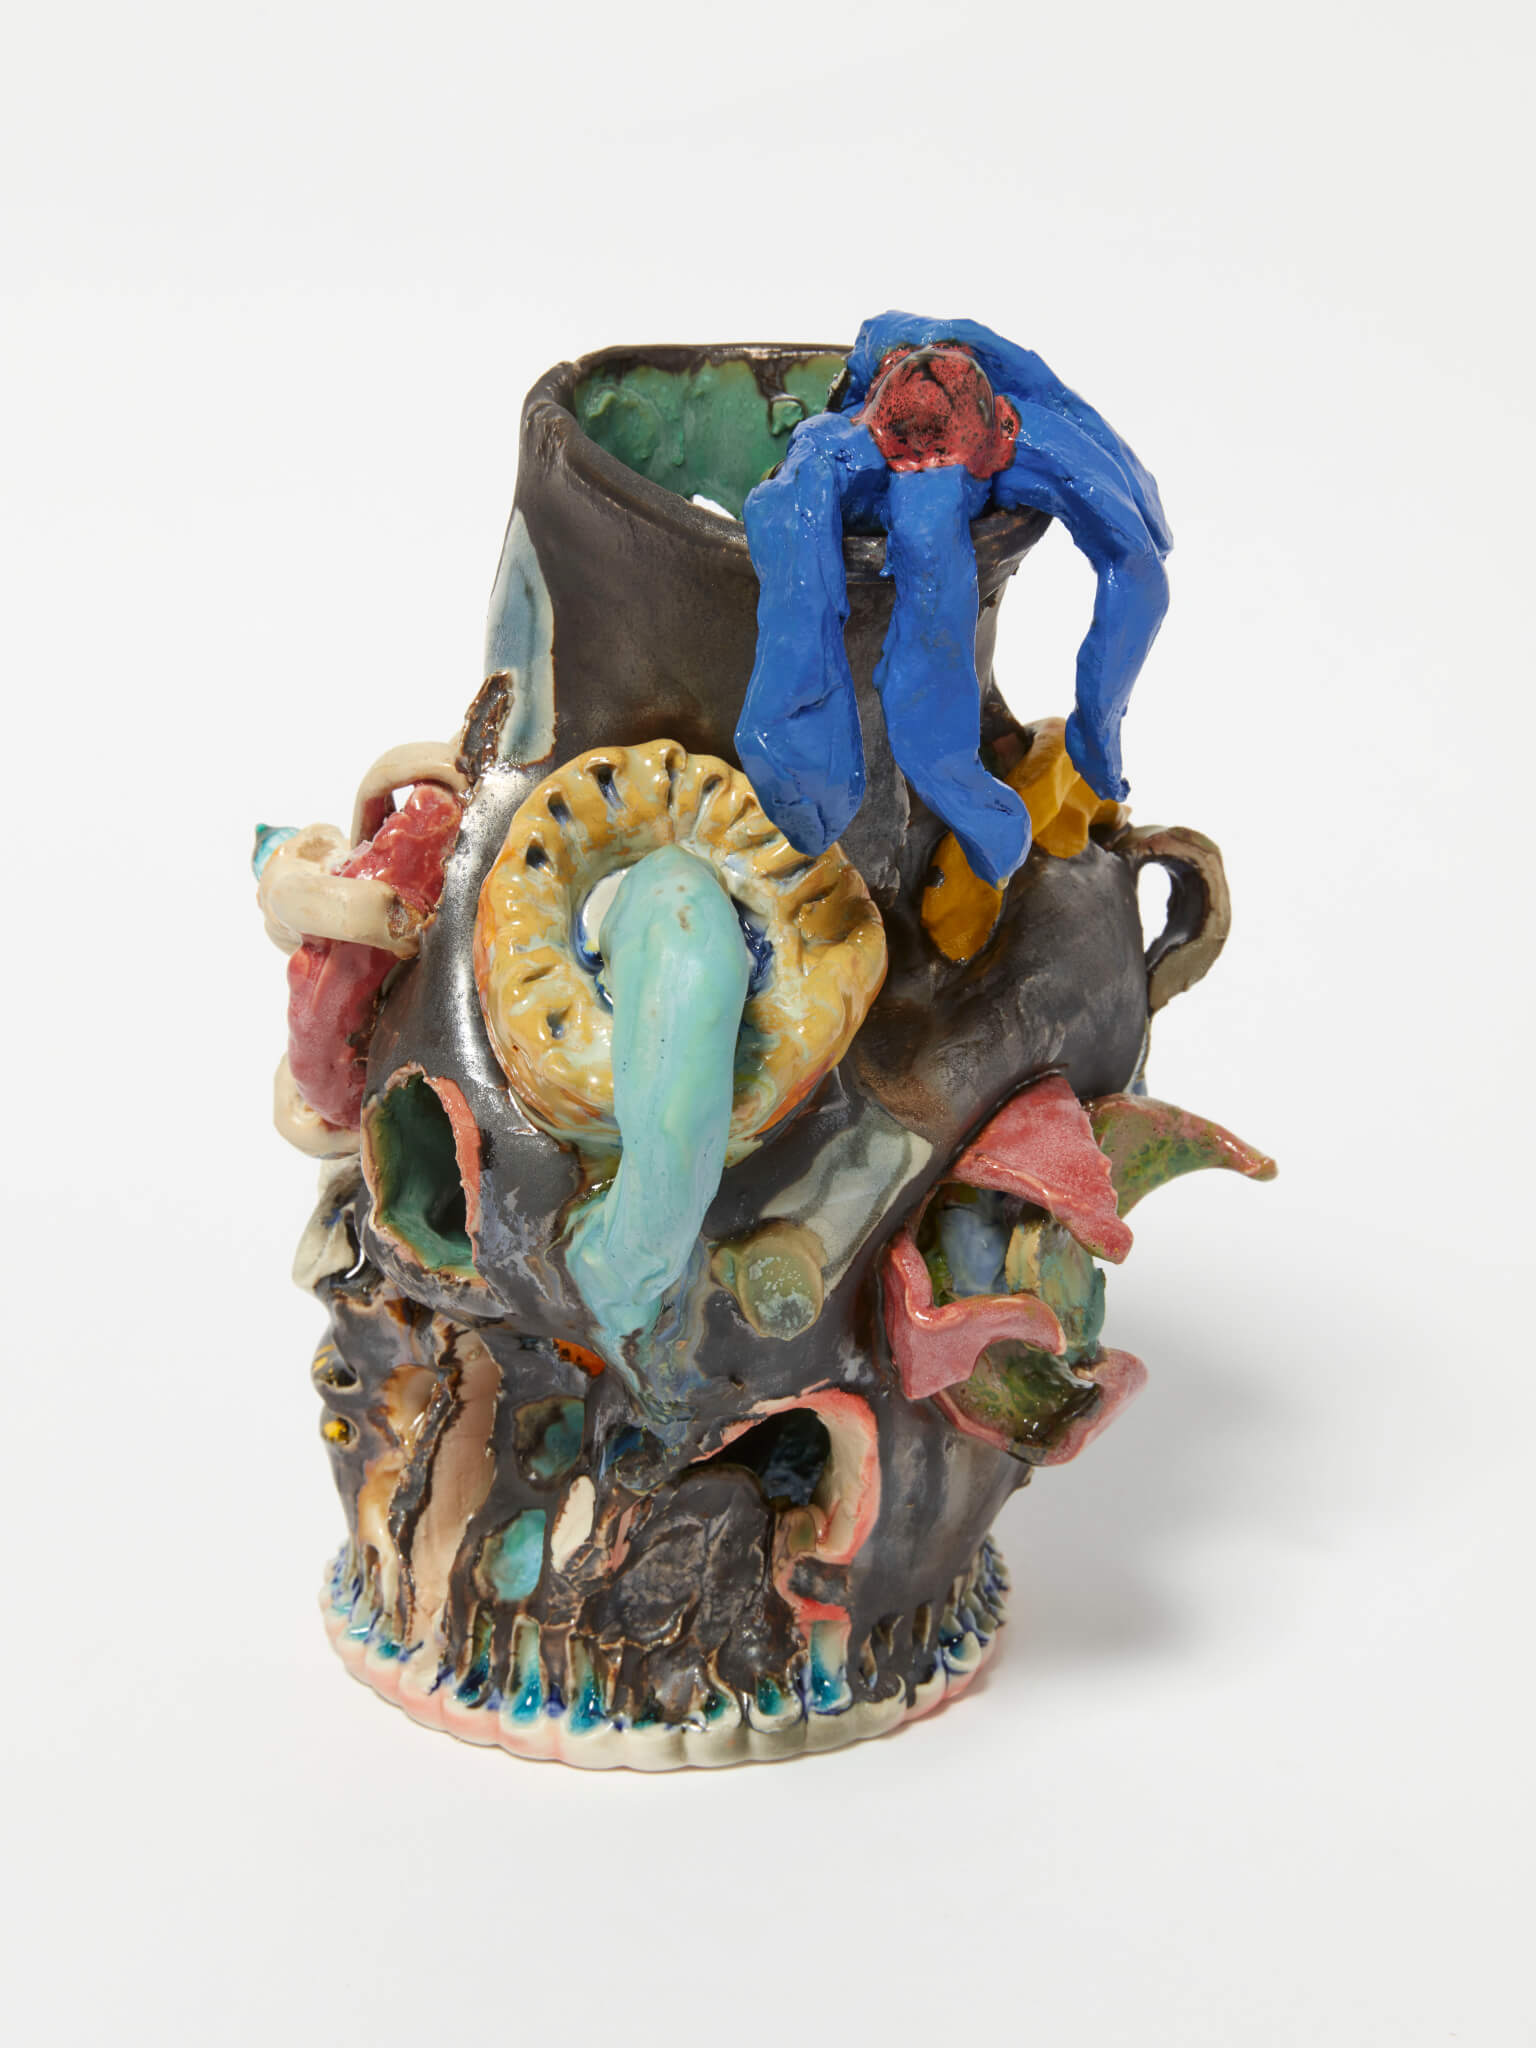 Farrag, Crooked Palm Jug, 2020 (SF 20.014) B